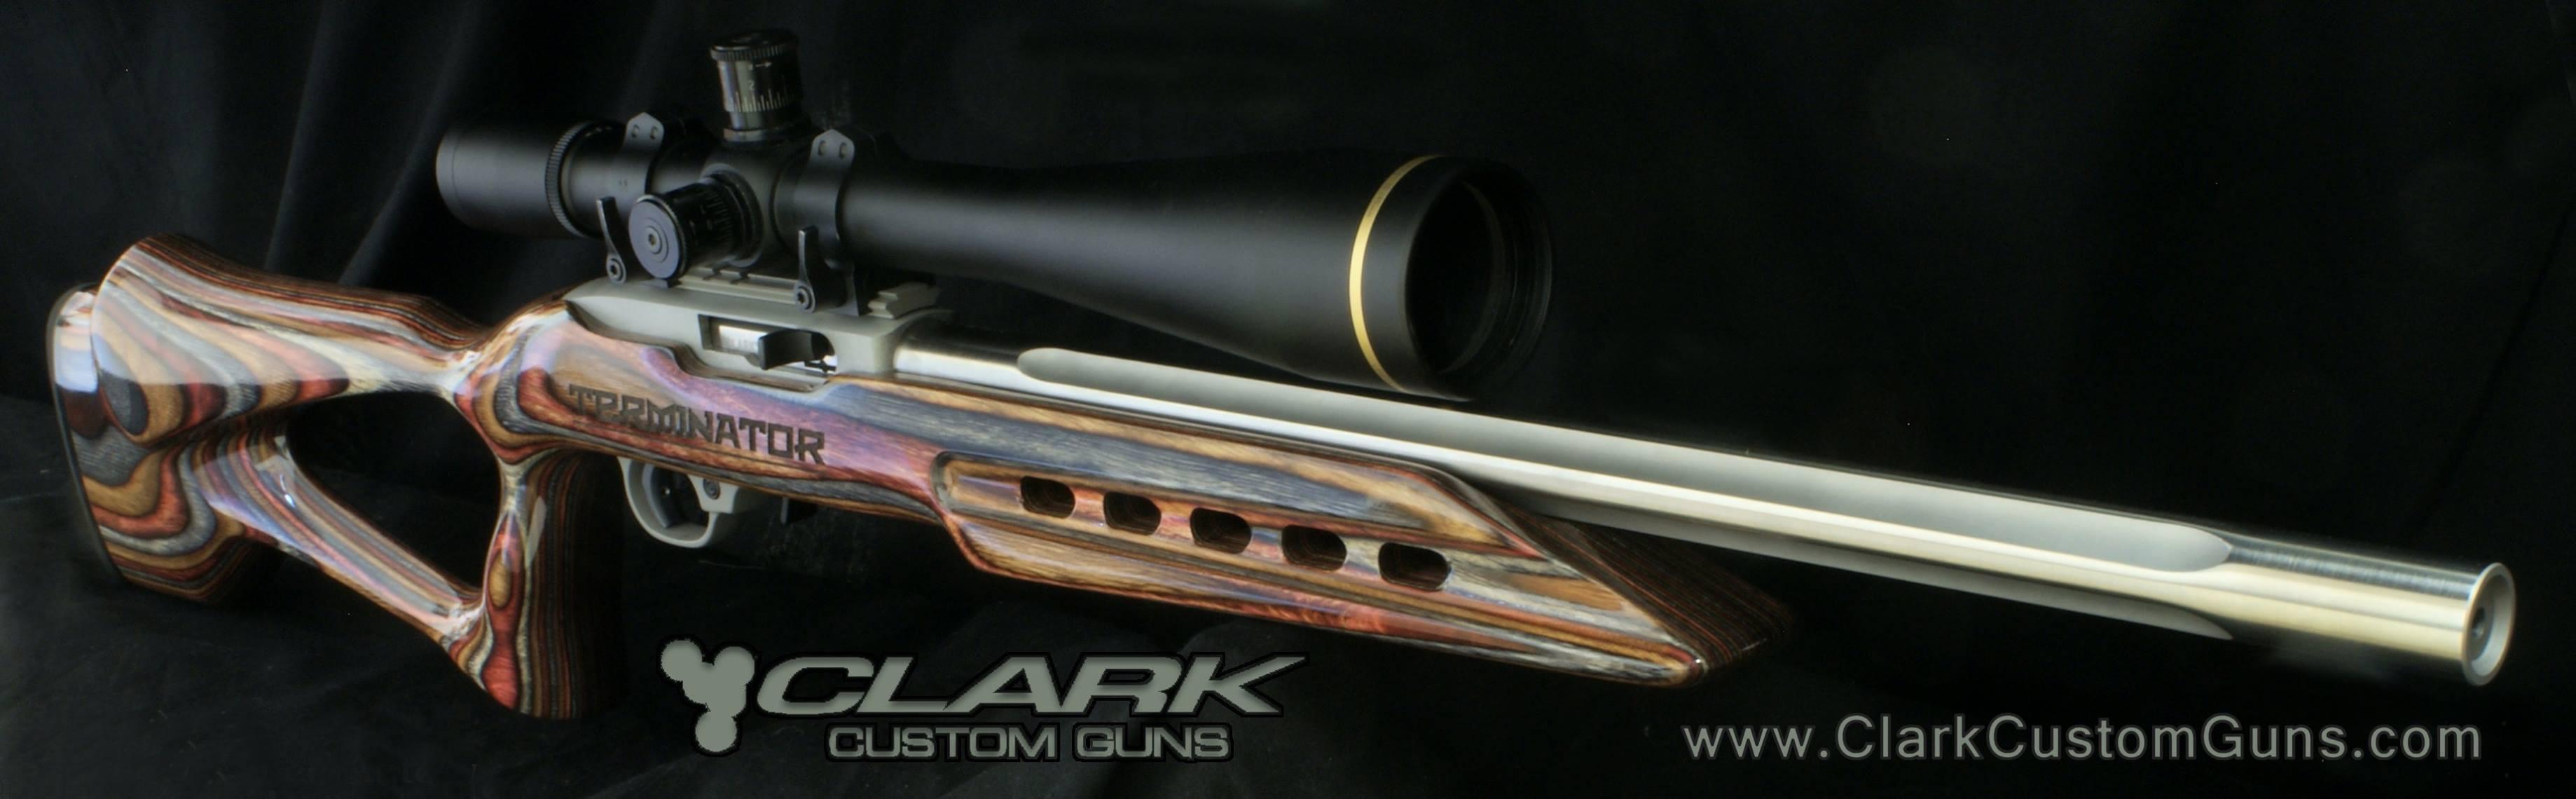 Clark Custom Guns image 2